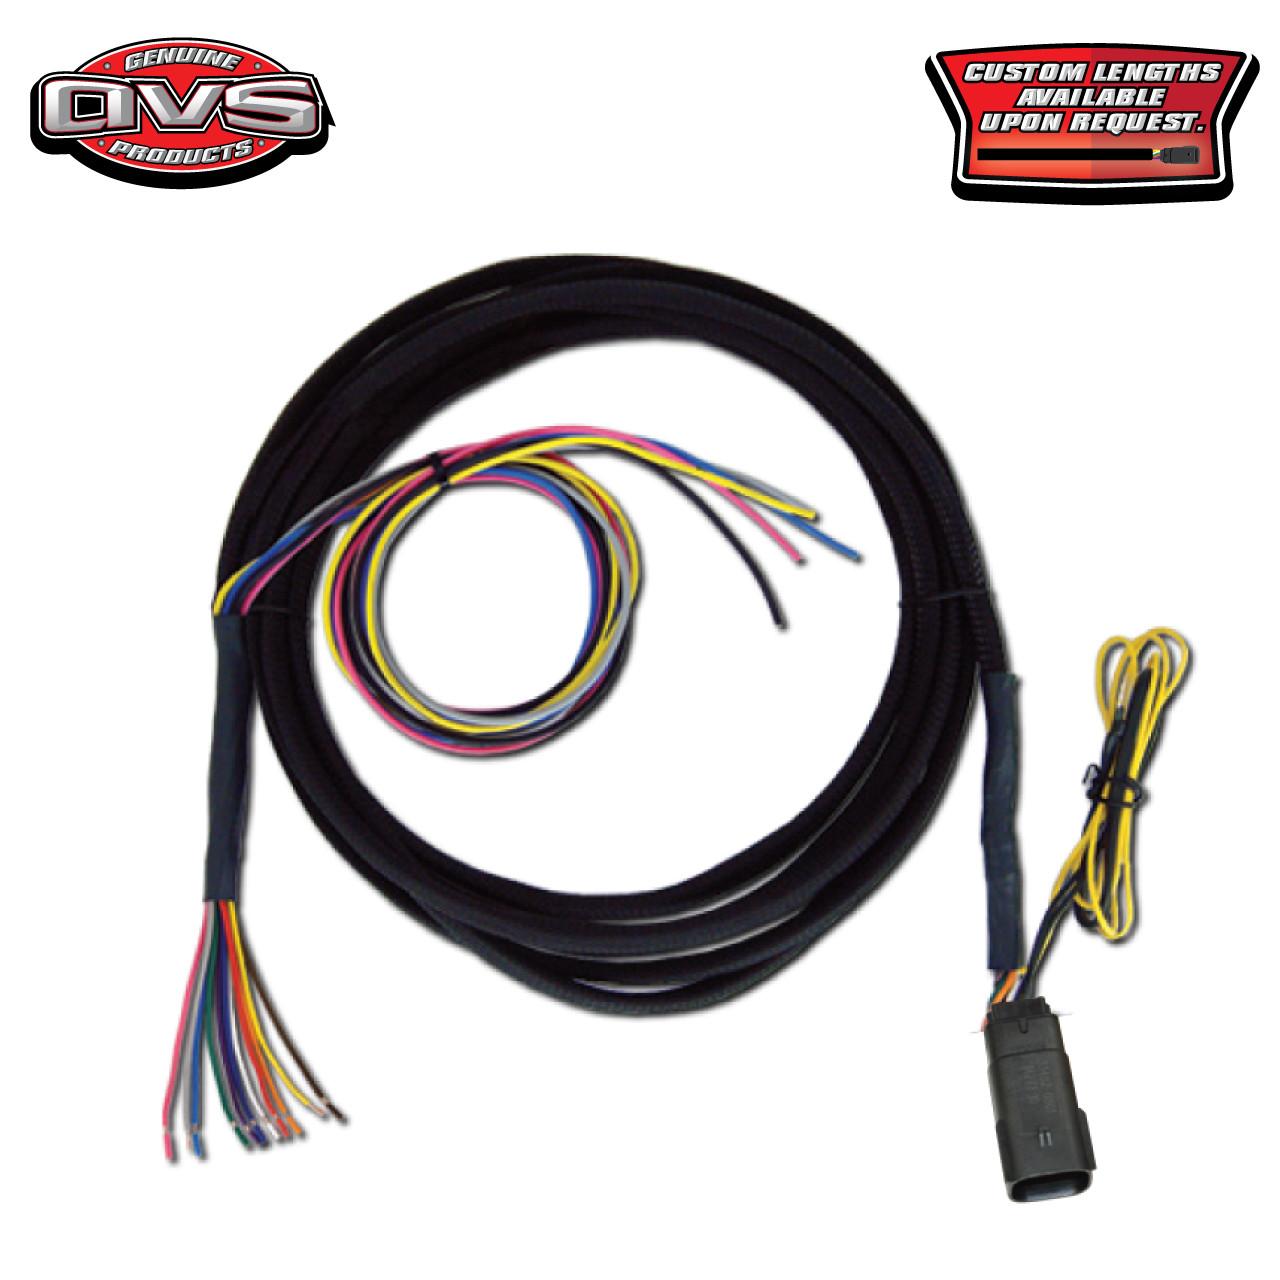 small resolution of avs valve wiring harness 10 15 20 accuair vx4 valve